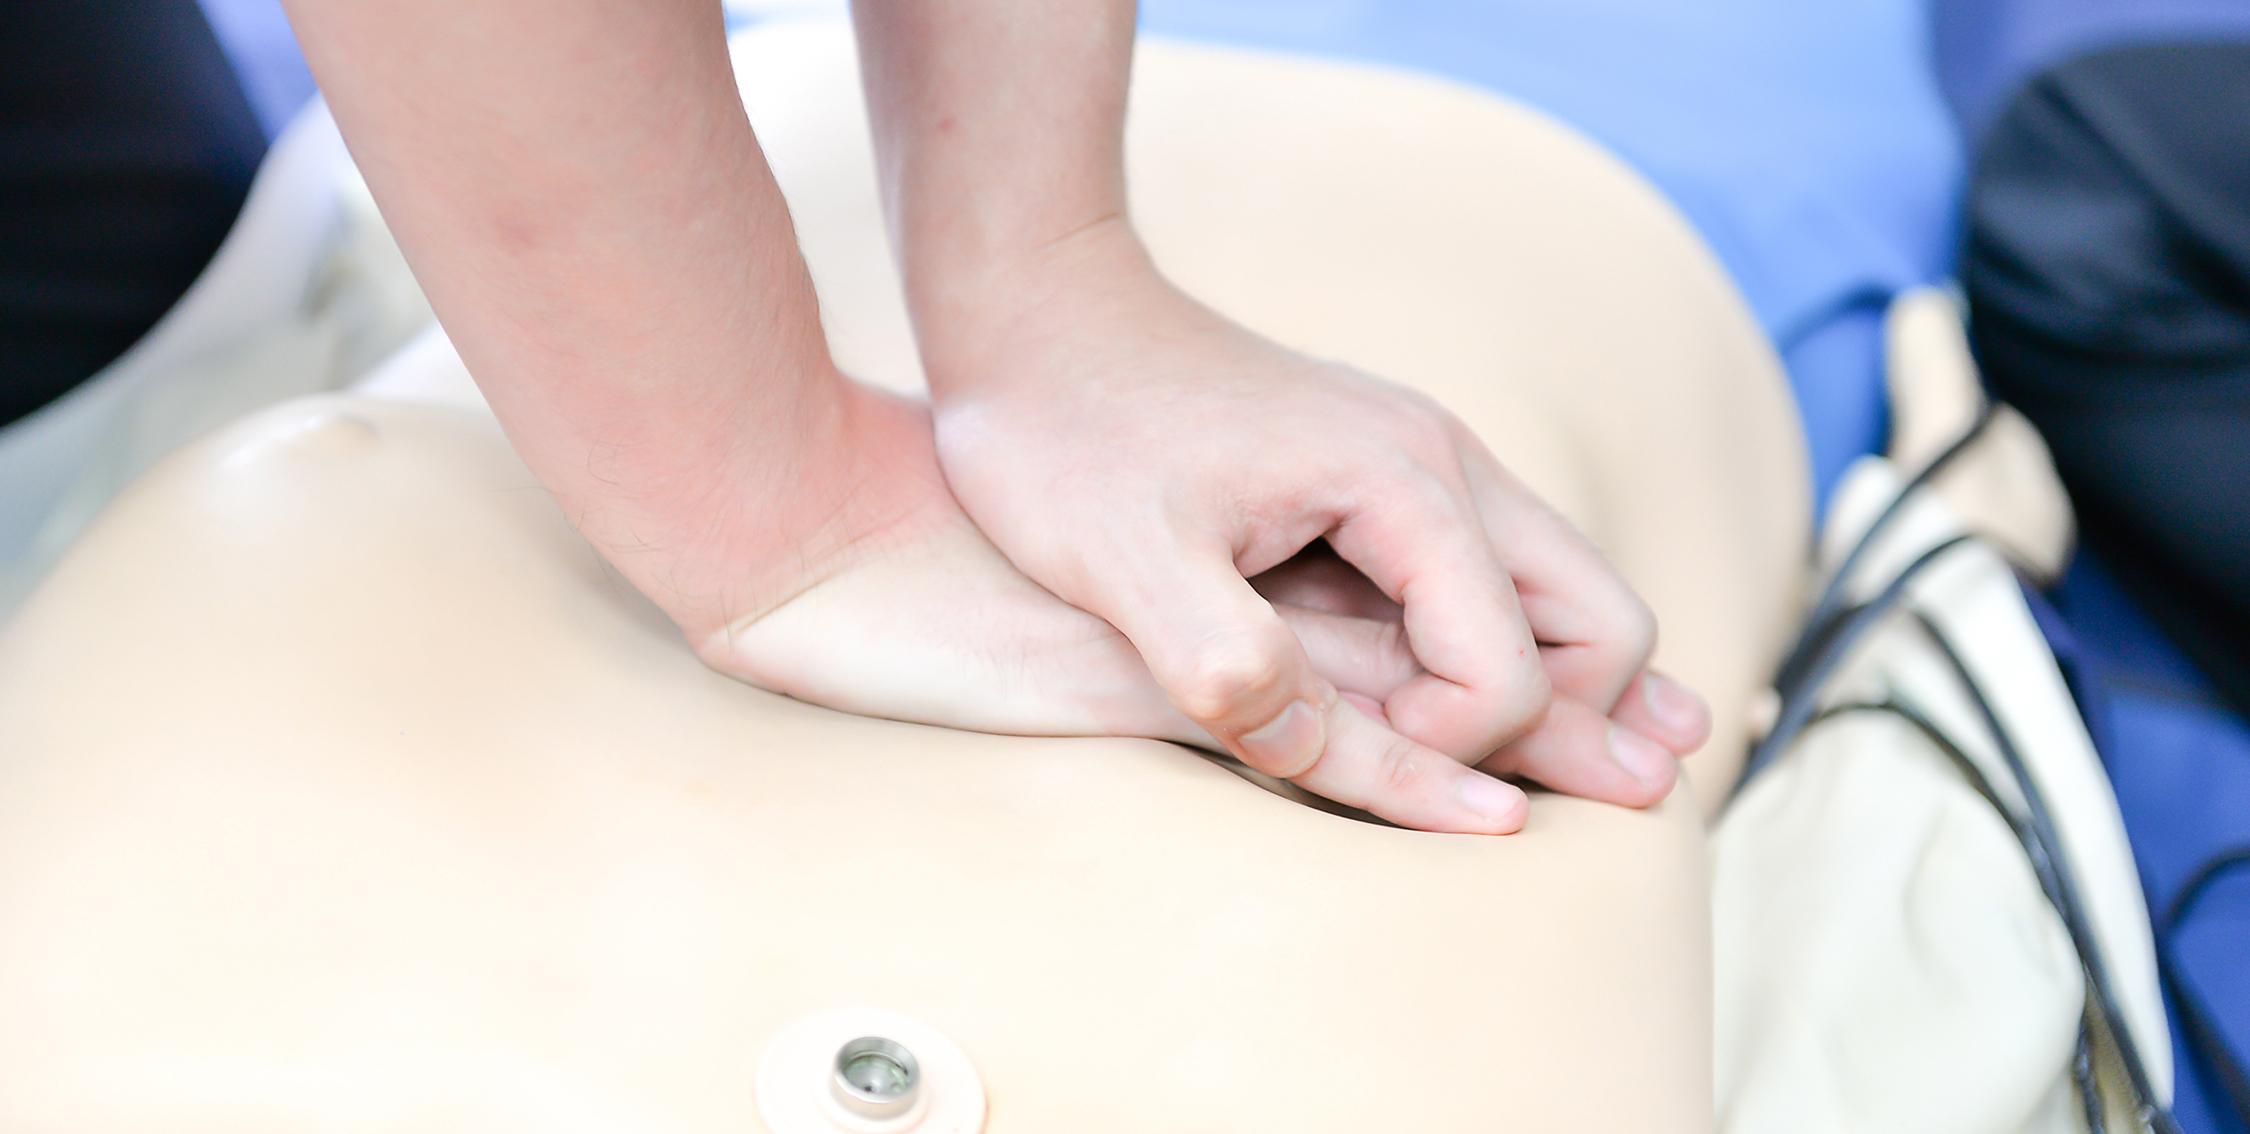 Basic First Aid Training | Think Safety | Cavan